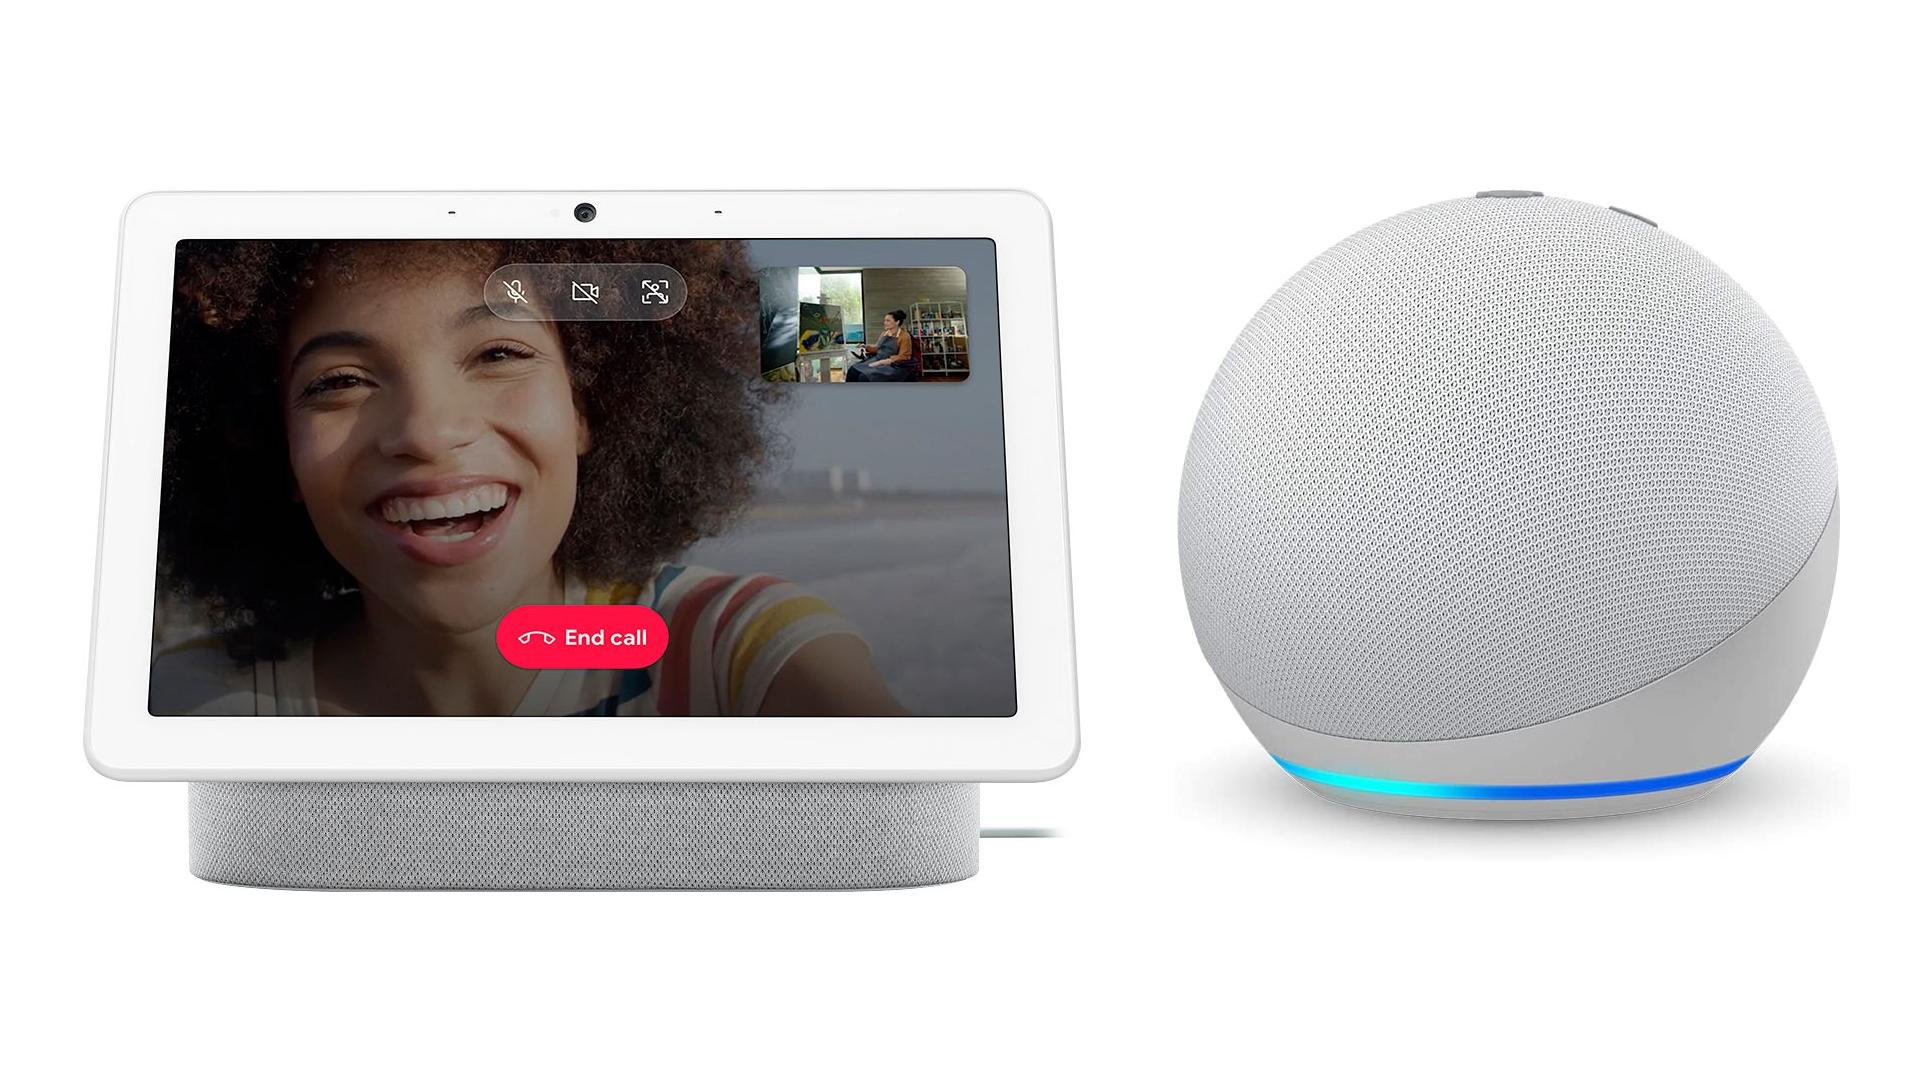 The Google Nest Hub Max and the Echo Dot smart speaker.